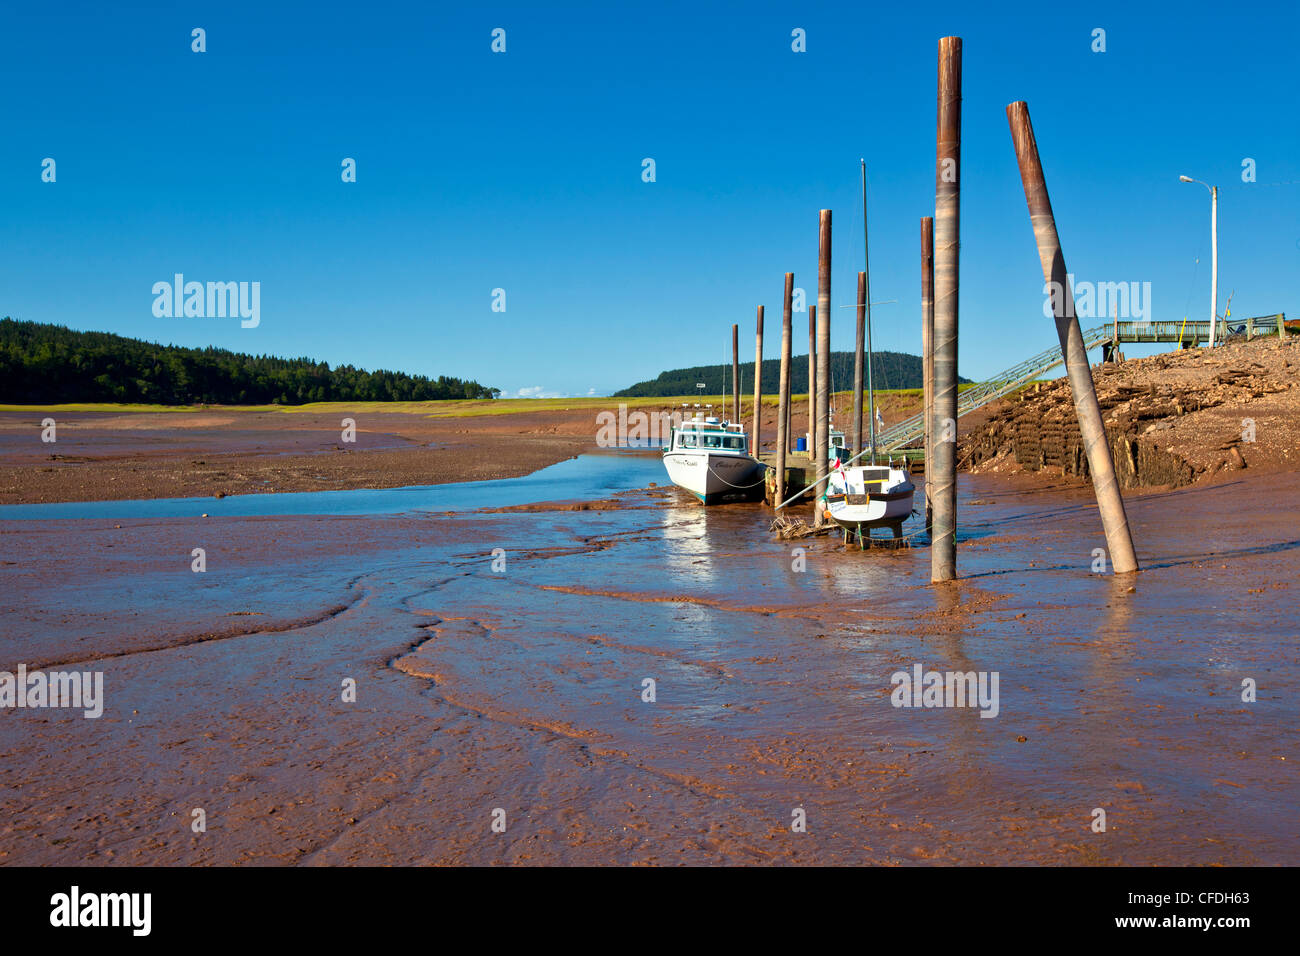 Fishing boats tied up at wharf at low tide, Five Islands, Nova Scotia, Canada - Stock Image